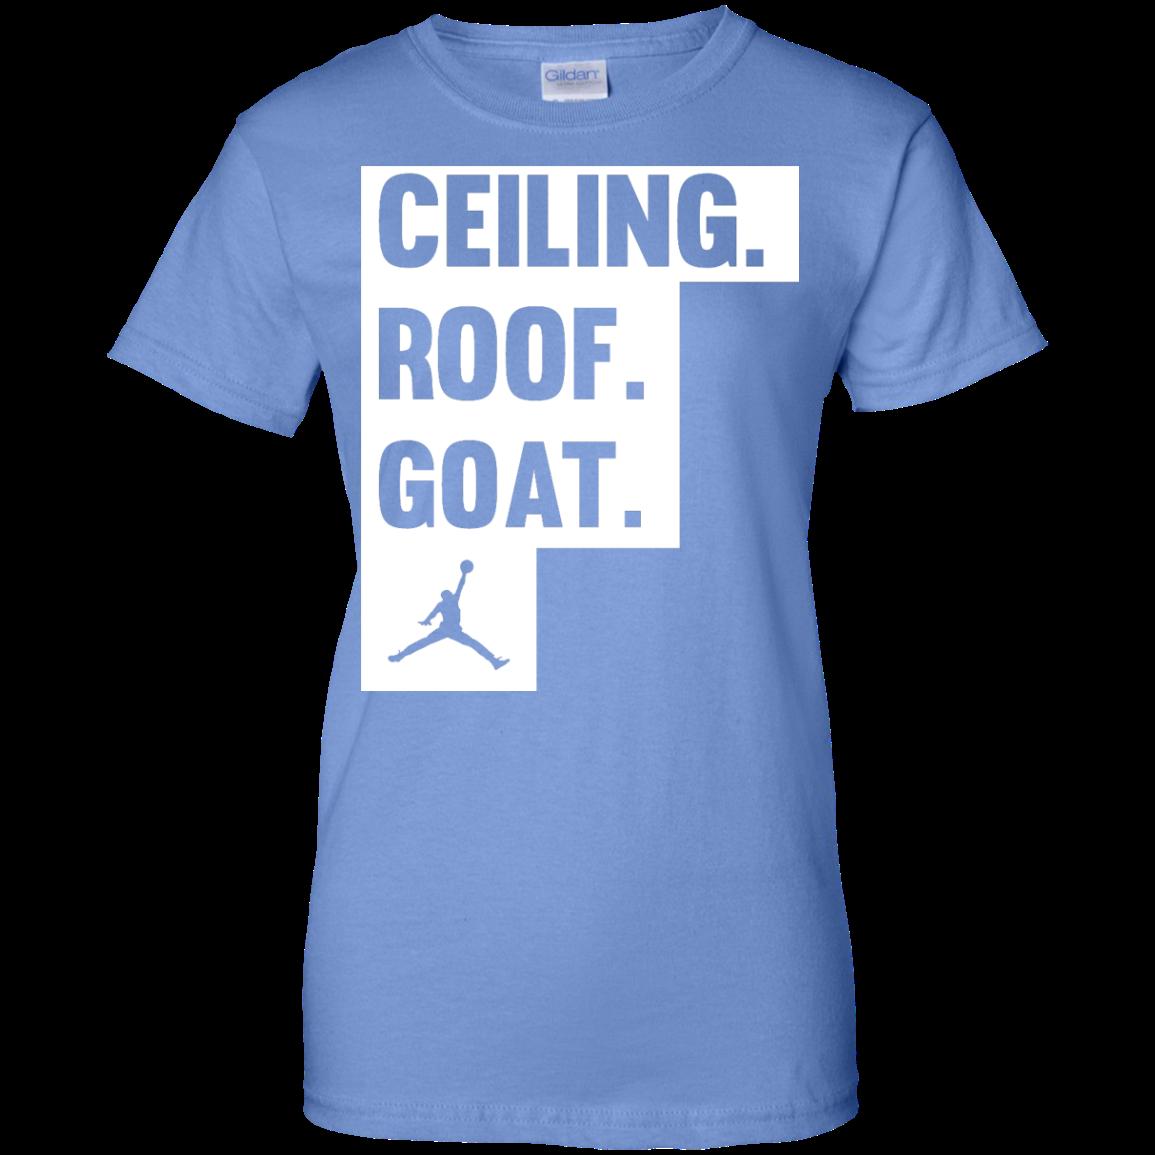 image 953px Jordan: Ceiling Roof Goat T Shirt, Hoodies, Tank